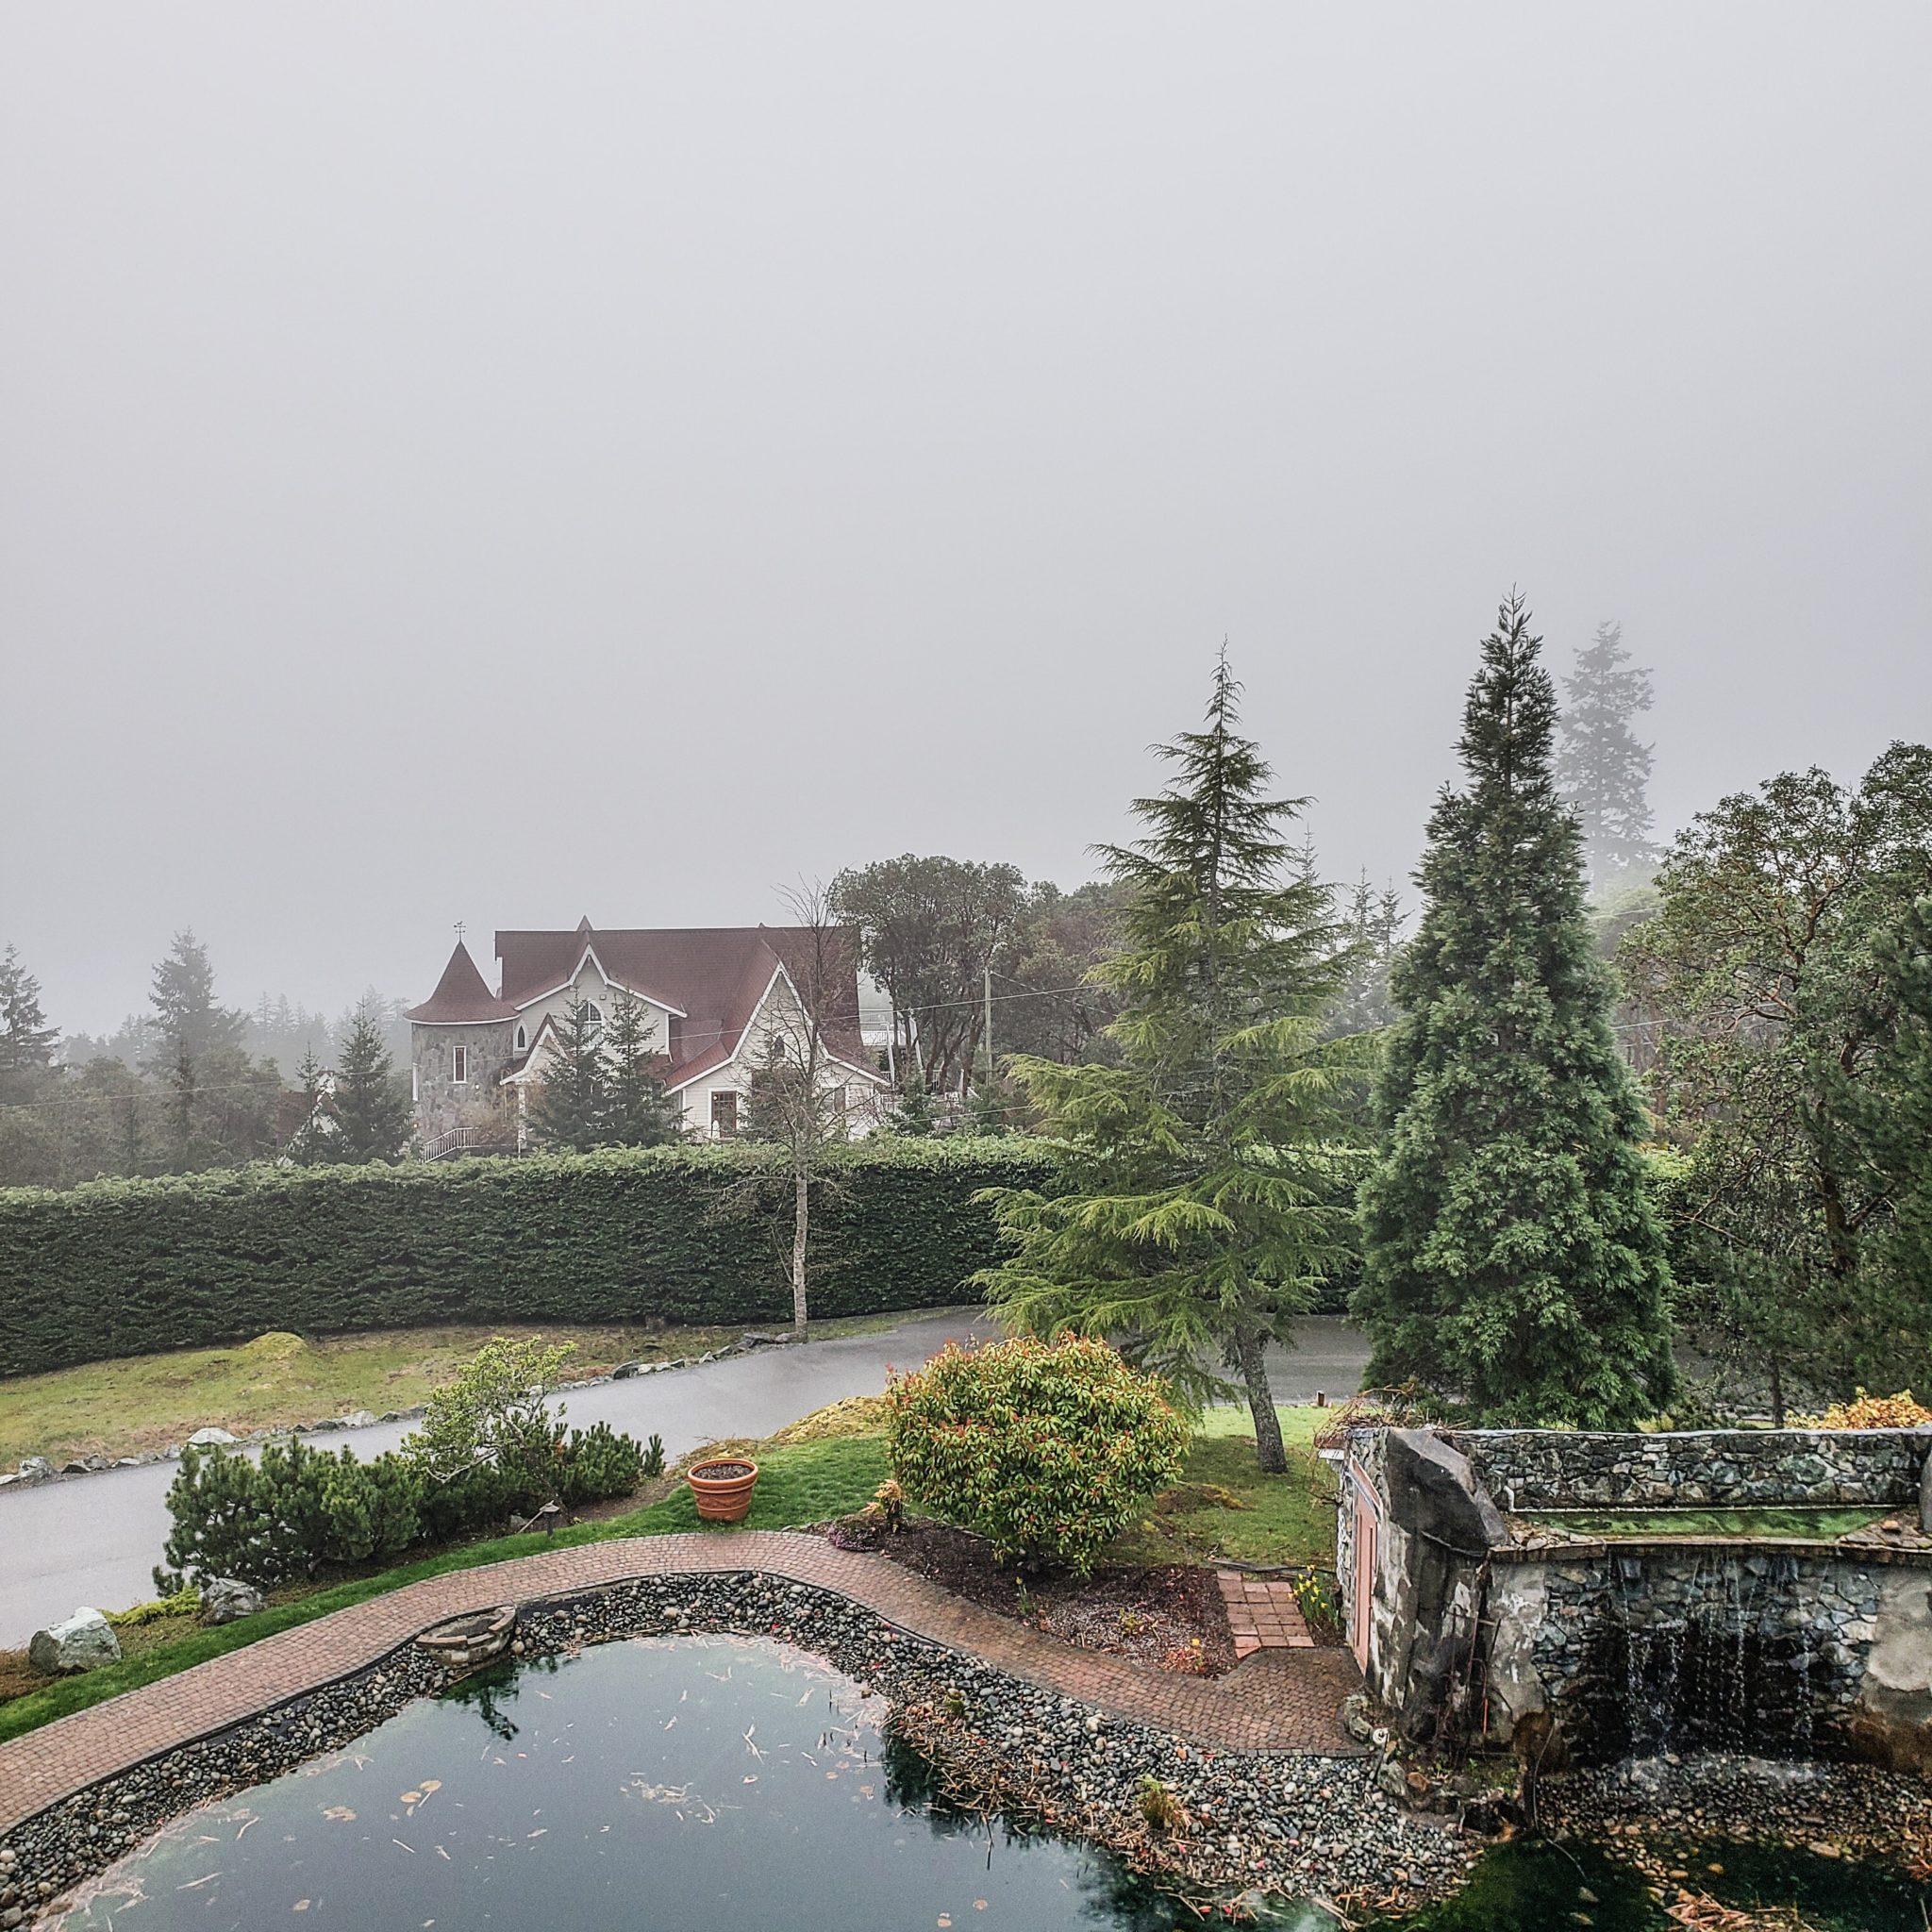 British Columbia's Hidden Paradise: Villa Eyrie Resort